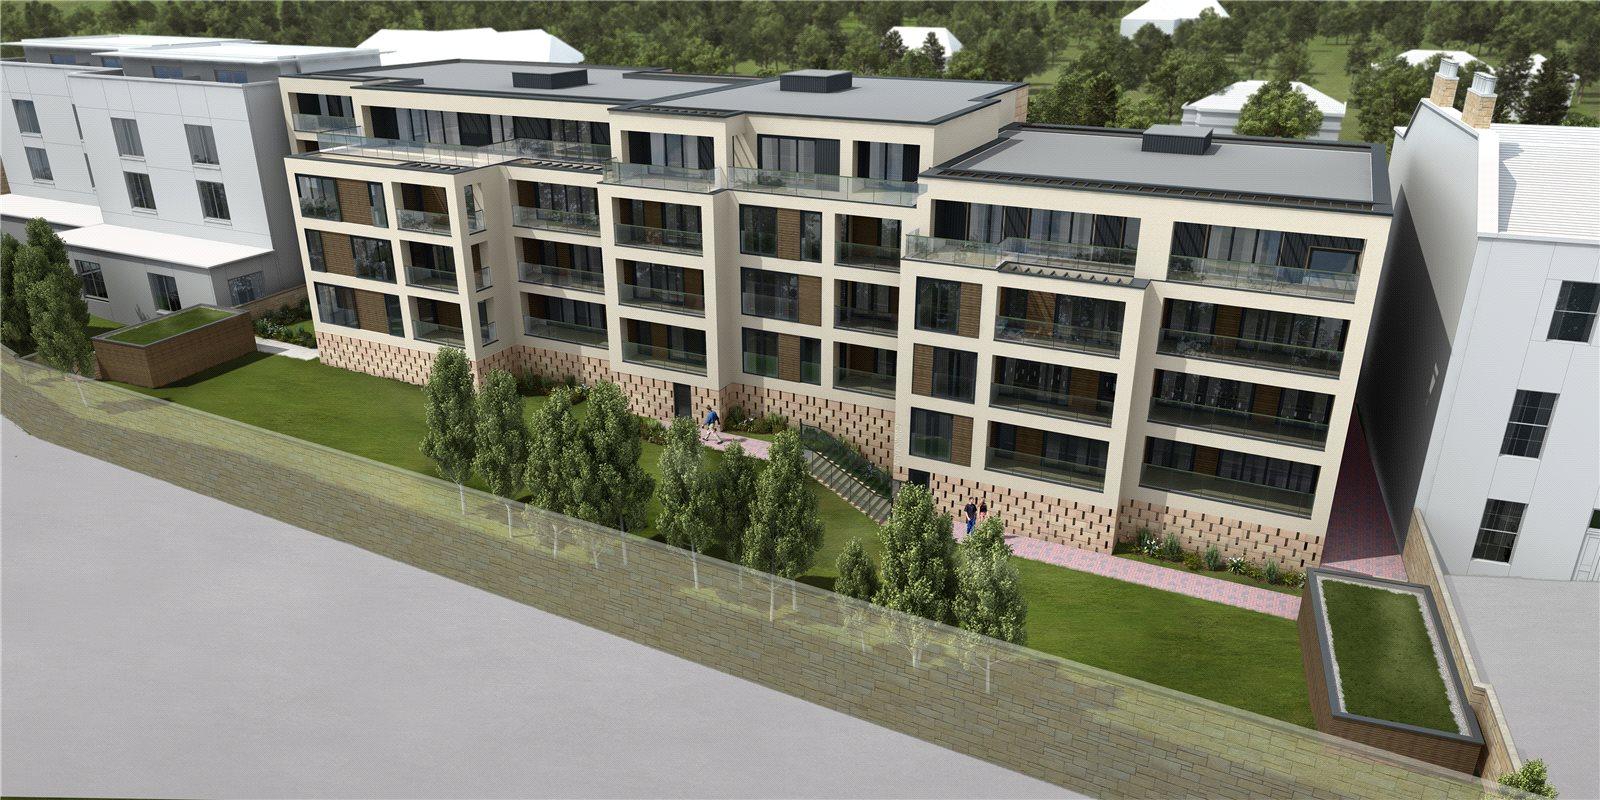 Additional photo for property listing at Newbattle Terrace, Edinburgh, EH10 Edinburgh, Scotland